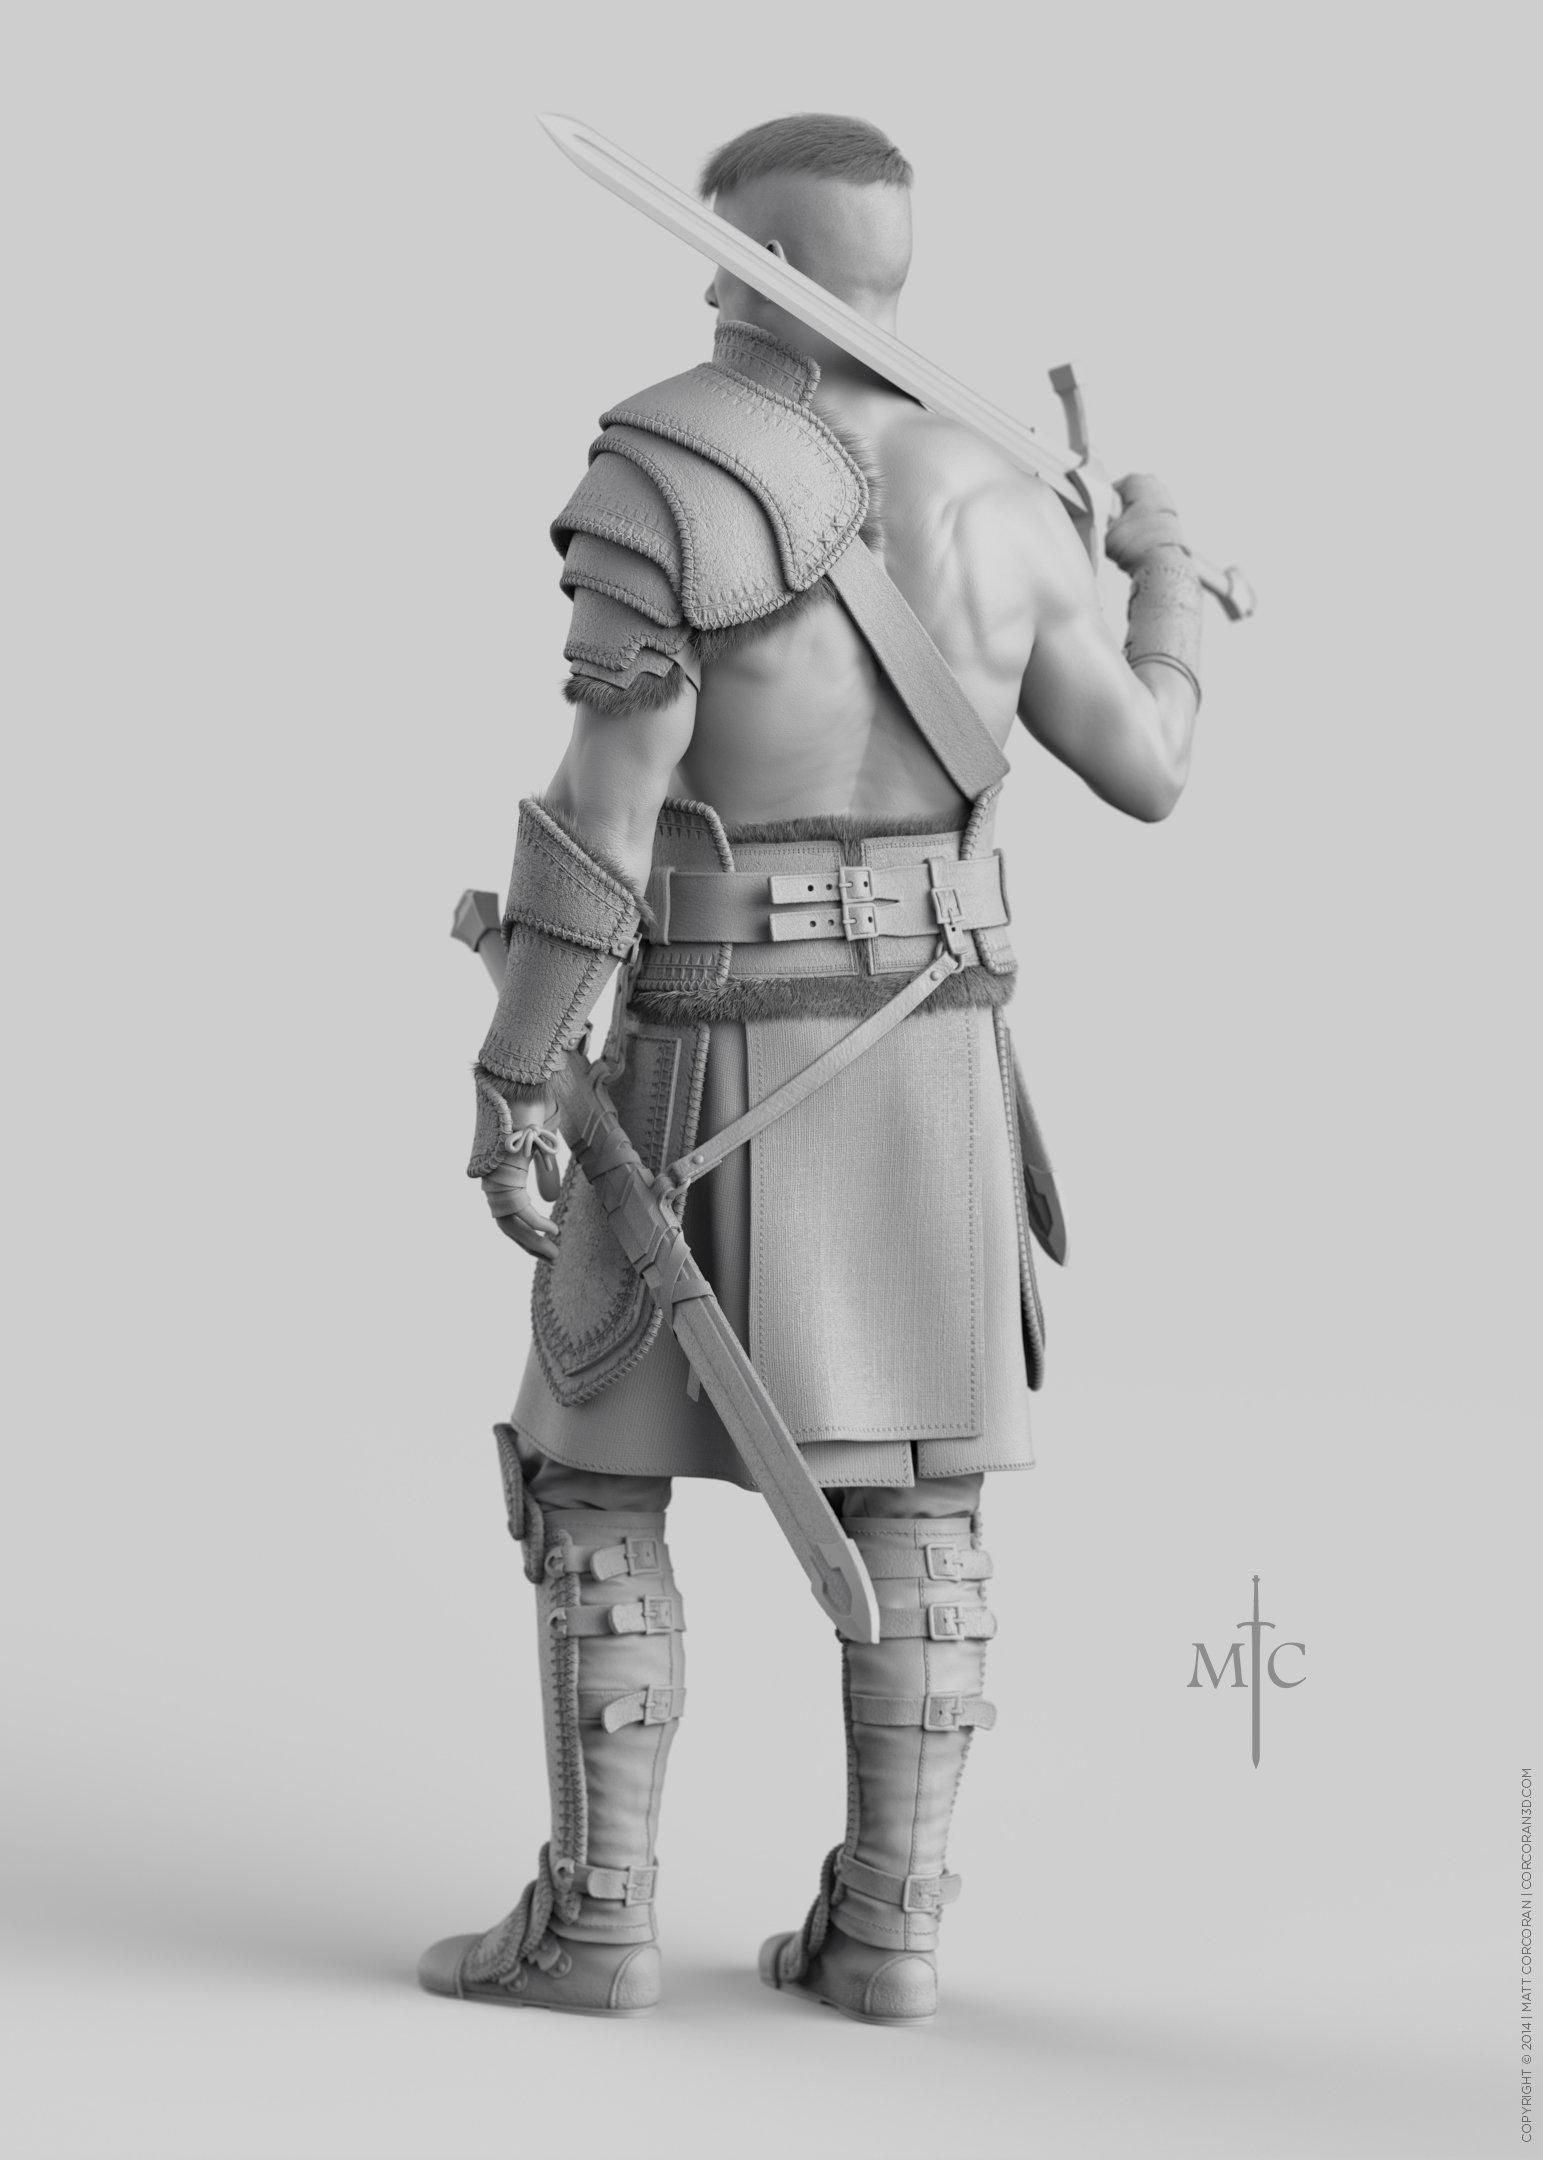 Matt corcoran mattcorcoran warrior grey 5x7 03